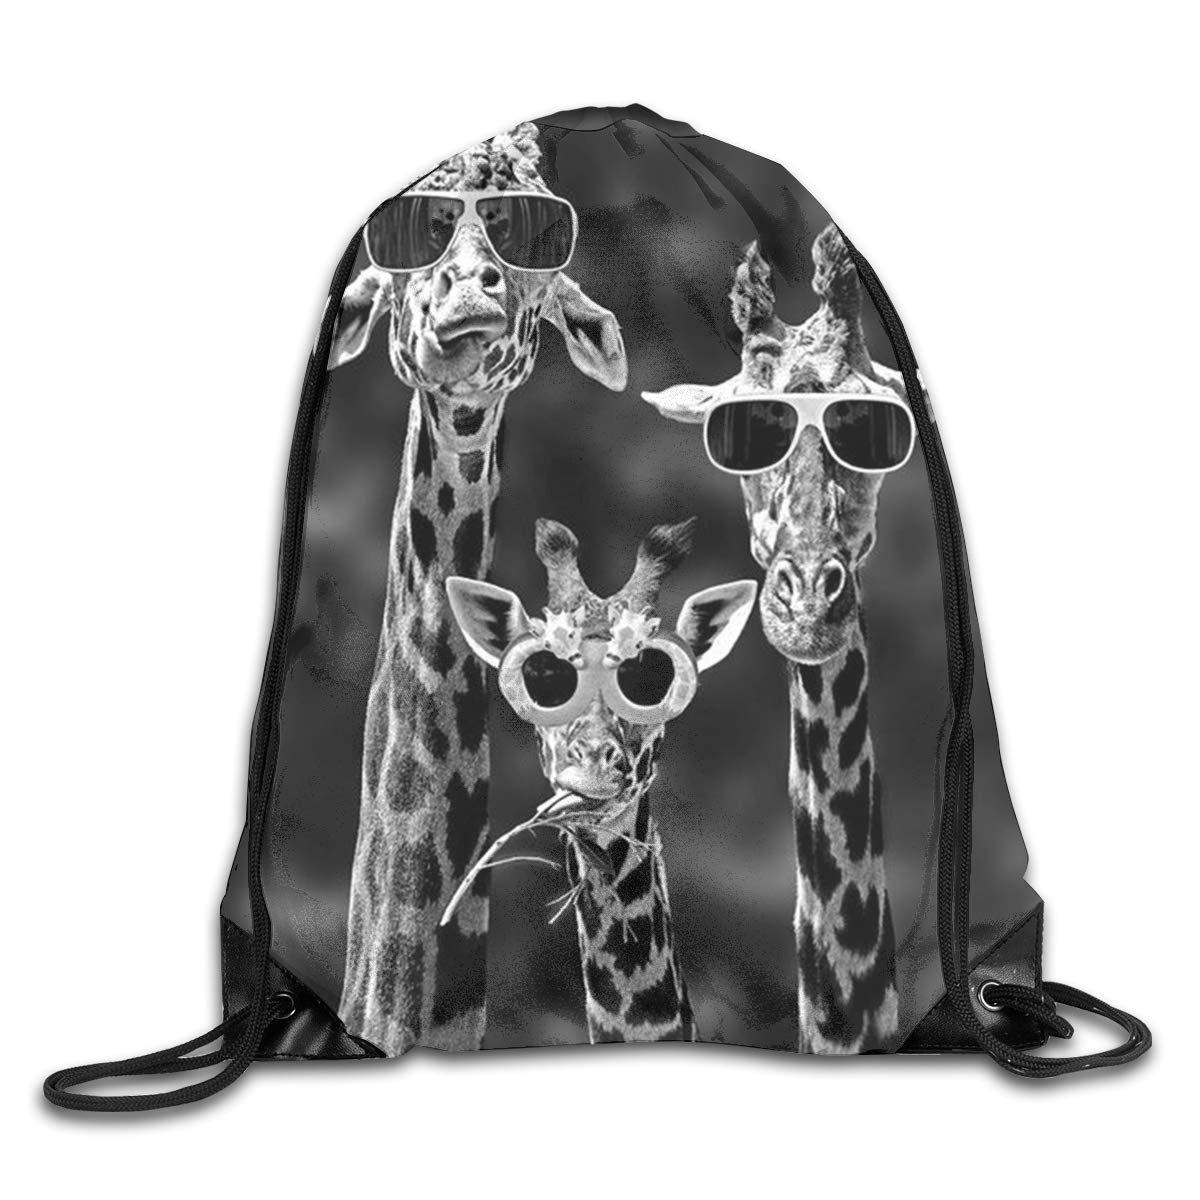 Amazon.com  Yuzioz Giraffe with Sunglasses Gym Sack Bag Drawstring Backpack  Sport Bag Men   Women School Travel Backpack,School,Beach  Sports   Outdoors ca94ca2397